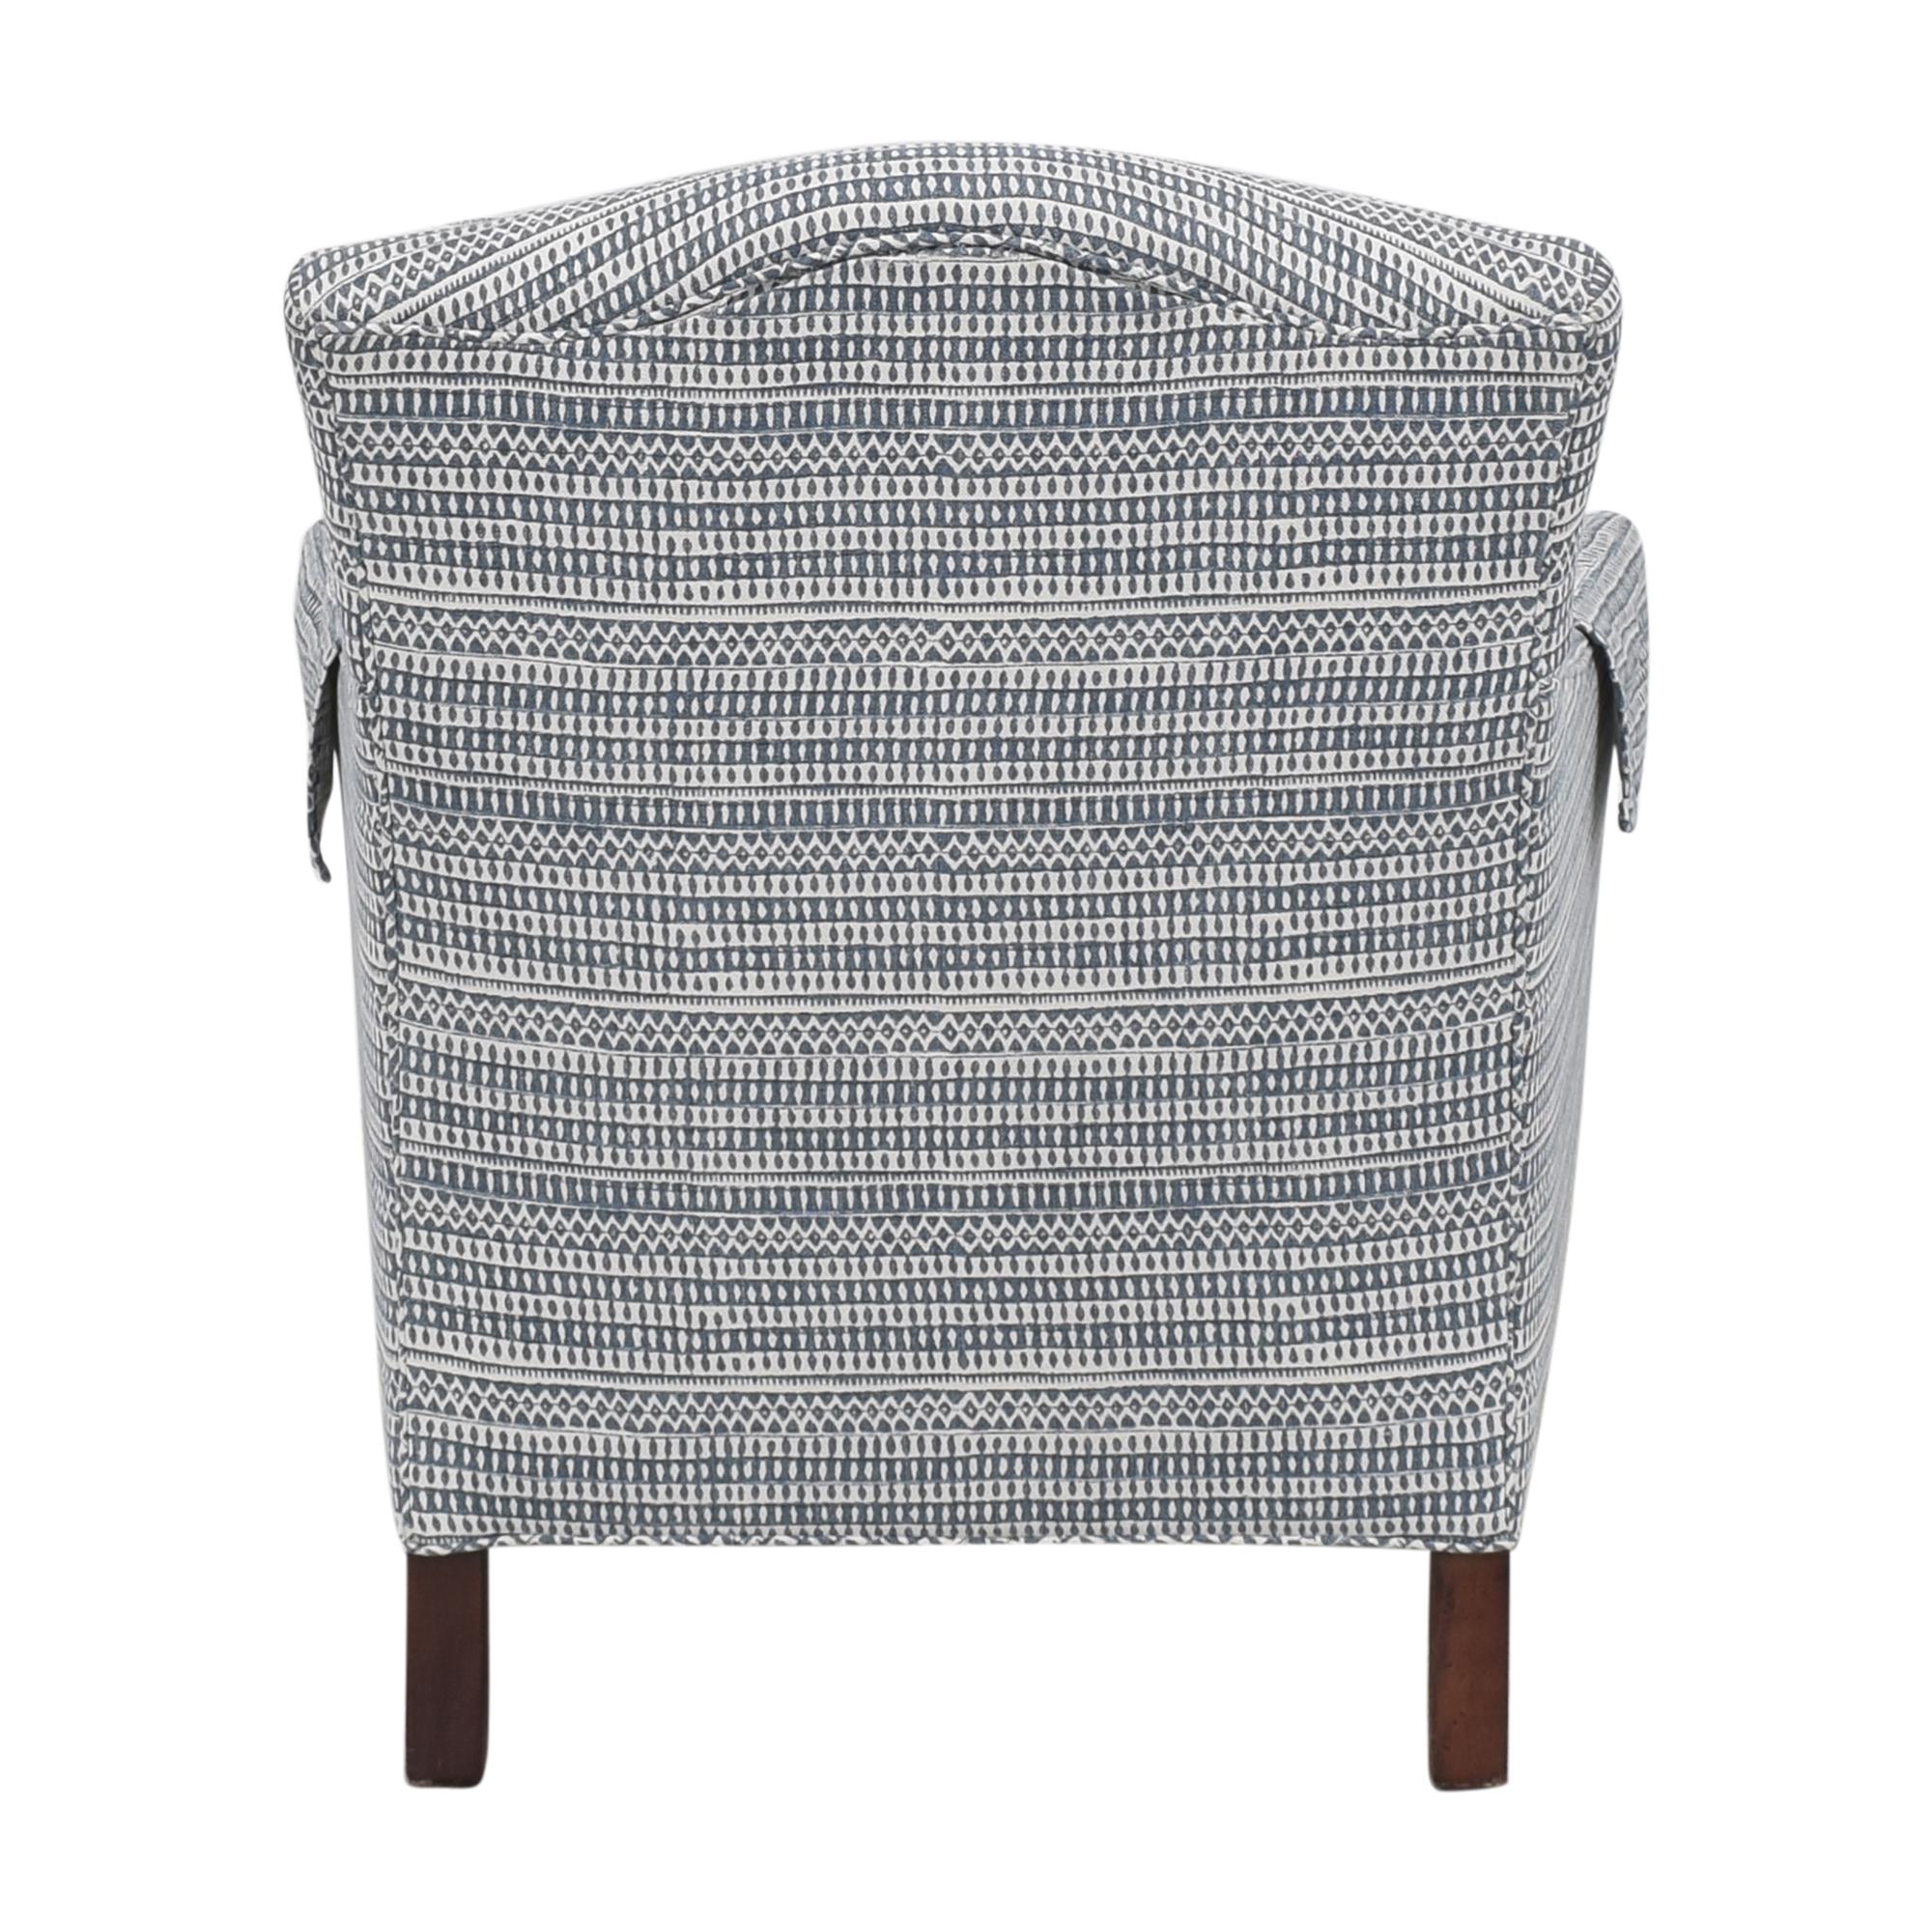 ABC Carpet & Home ABC Carpet & Home Accent Chair dimensions